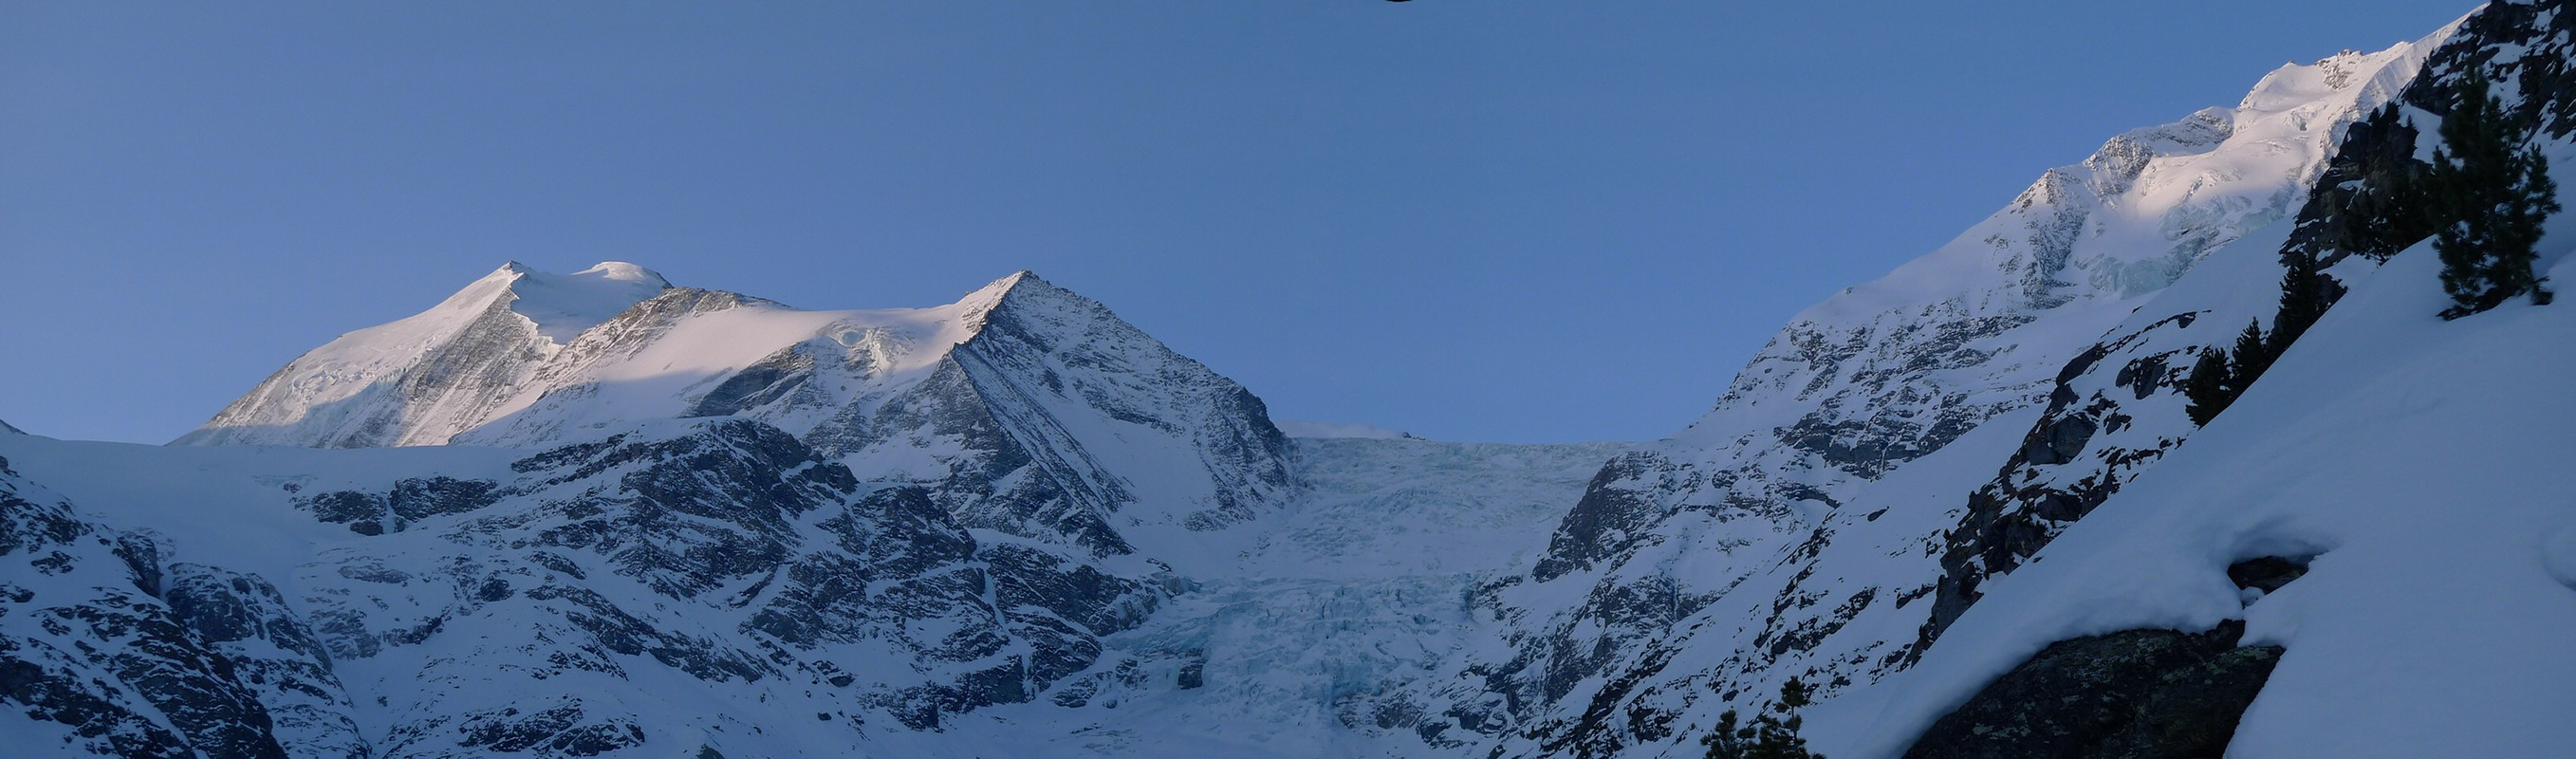 Turtmannhütte / Cabane Tourtemagne  Walliser Alpen / Alpes valaisannes Švýcarsko panorama 12